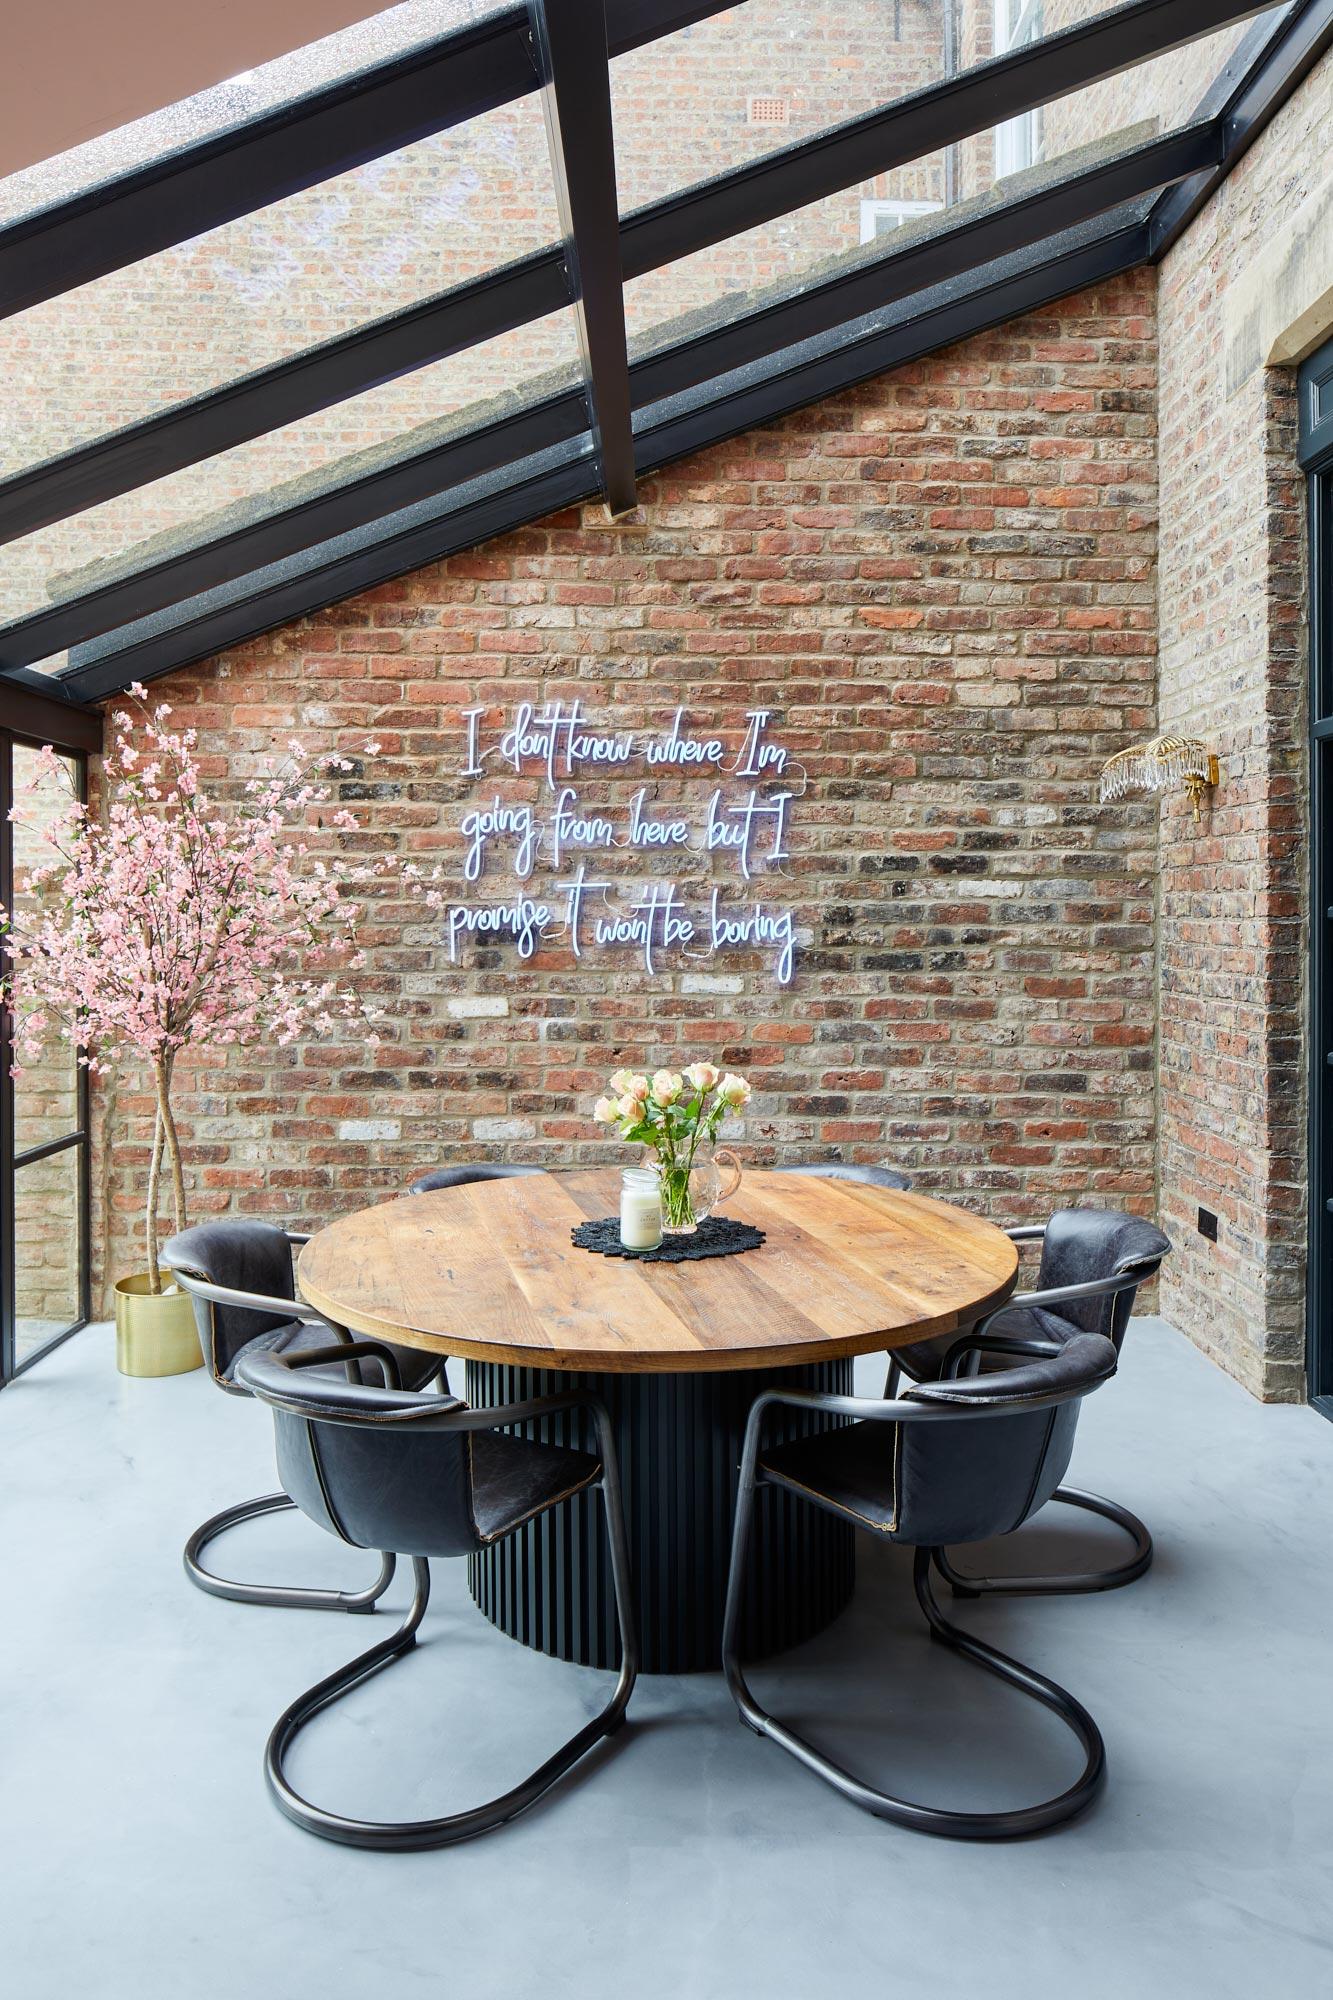 Bespoke round kitchen table